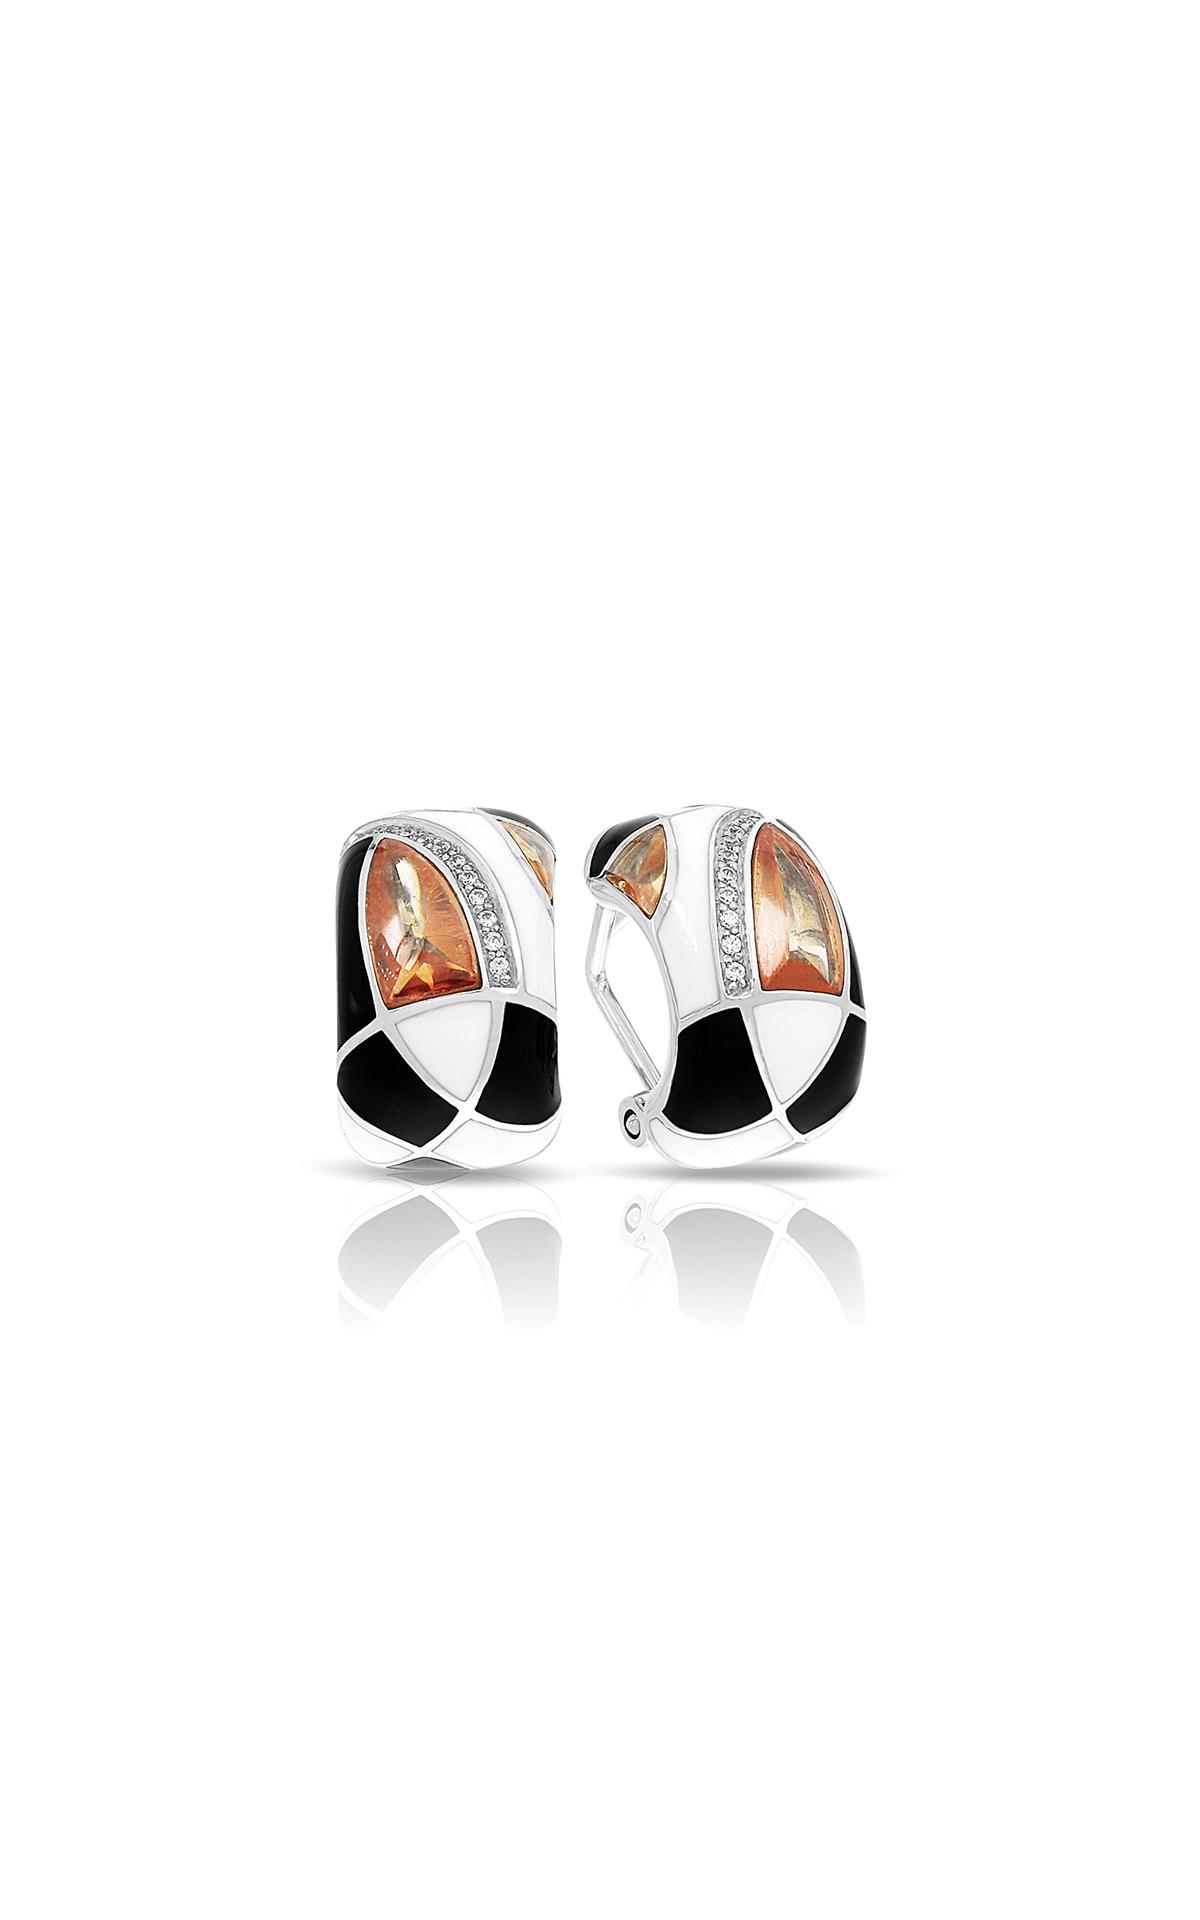 Belle Etoile Tango Champagne, Black, & White Earrings 03021320604 product image